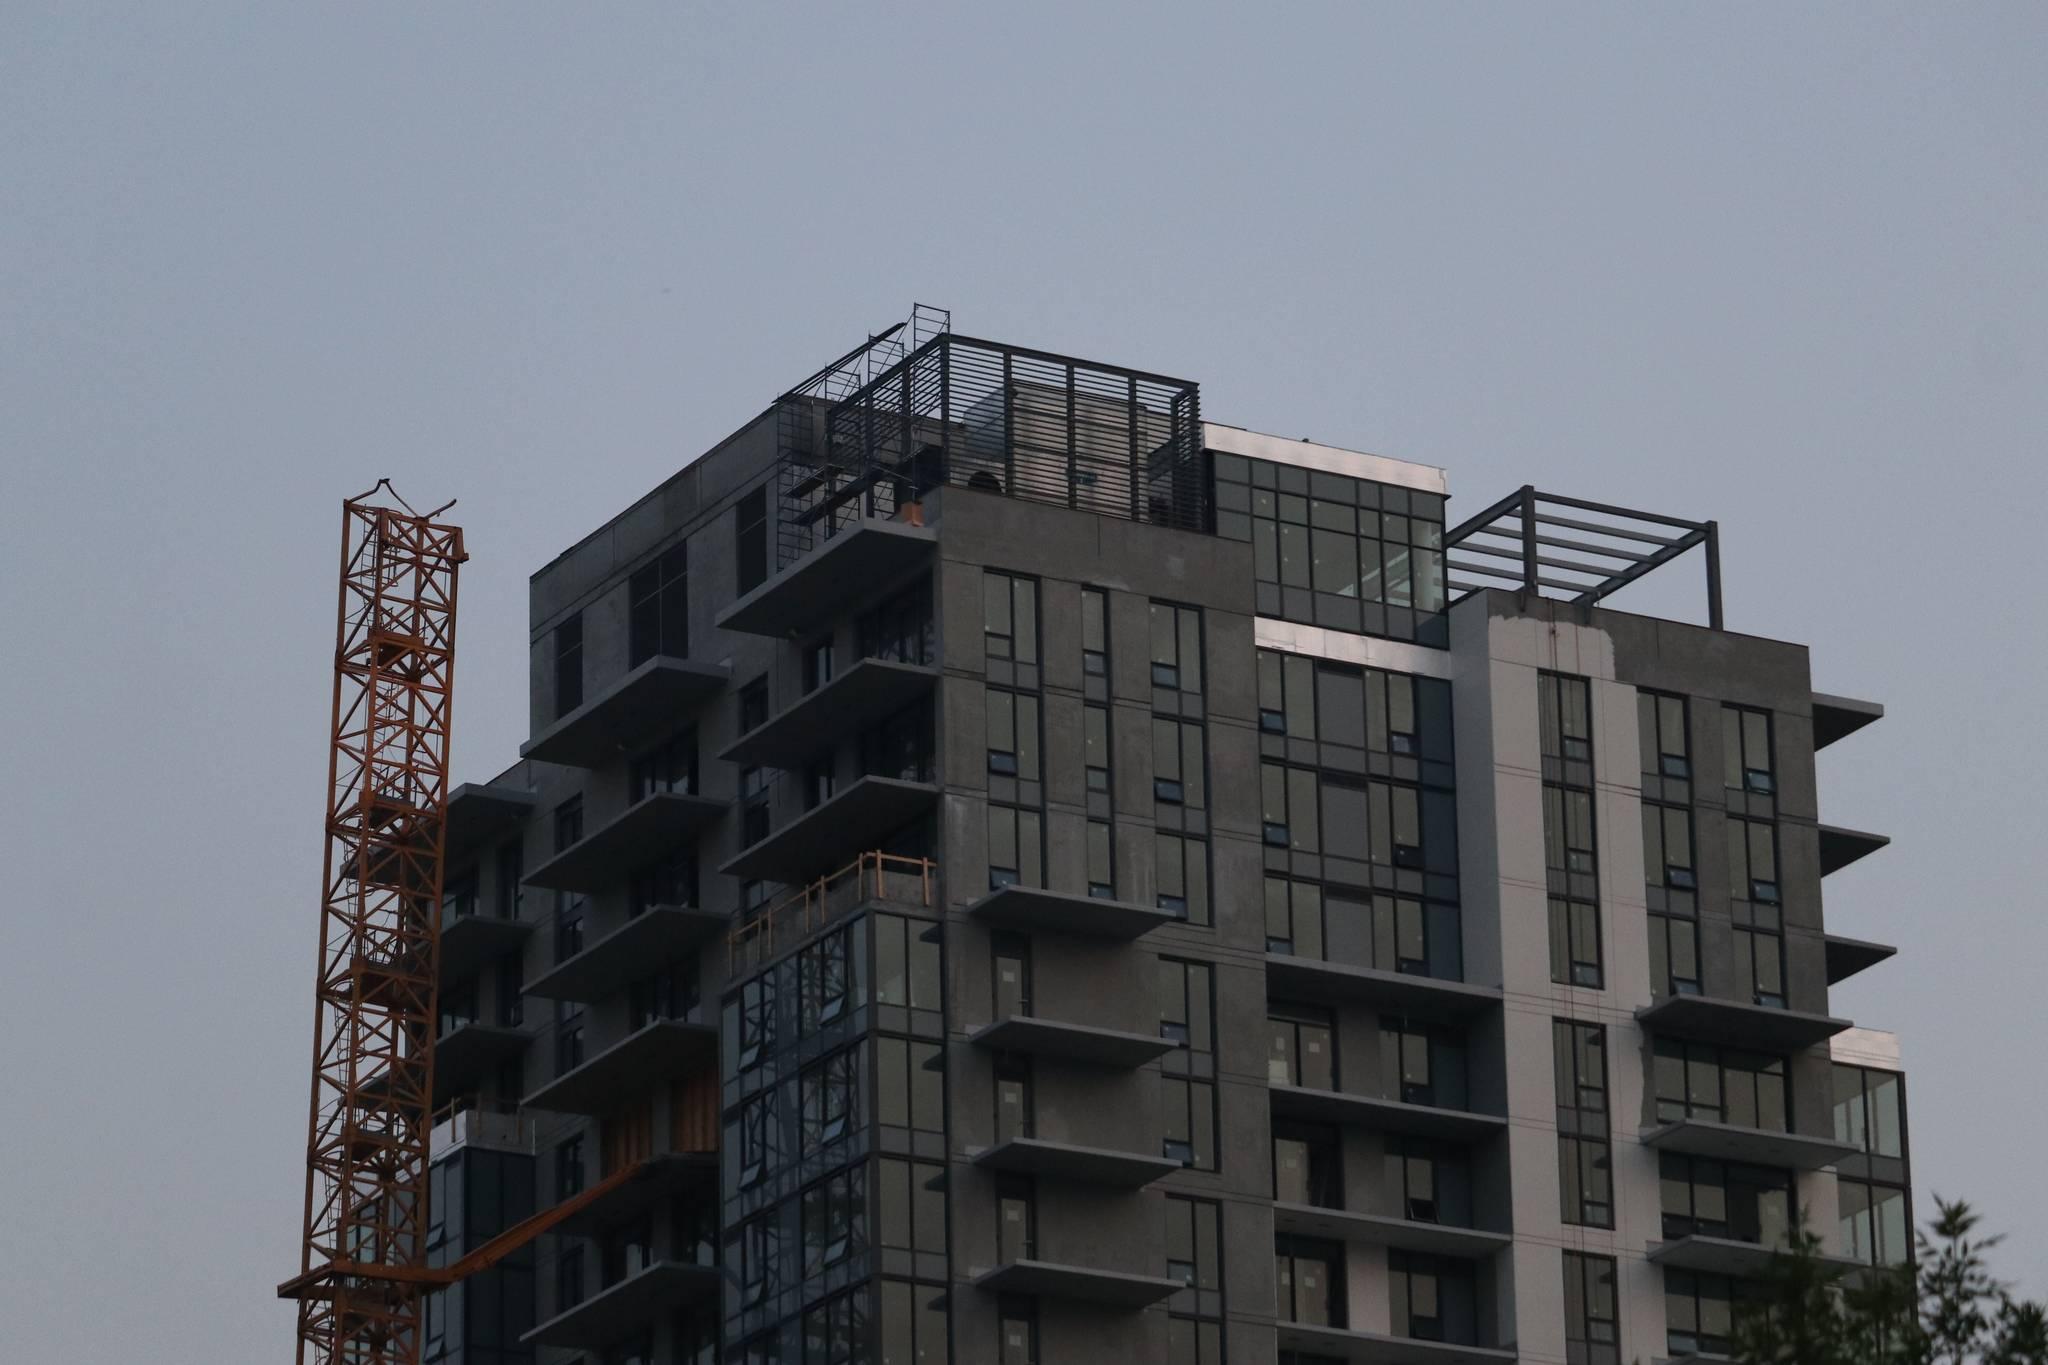 The crane on Tuesday, July 13, before crews began the dismantling process. (Aaron Hemens/Capital News)